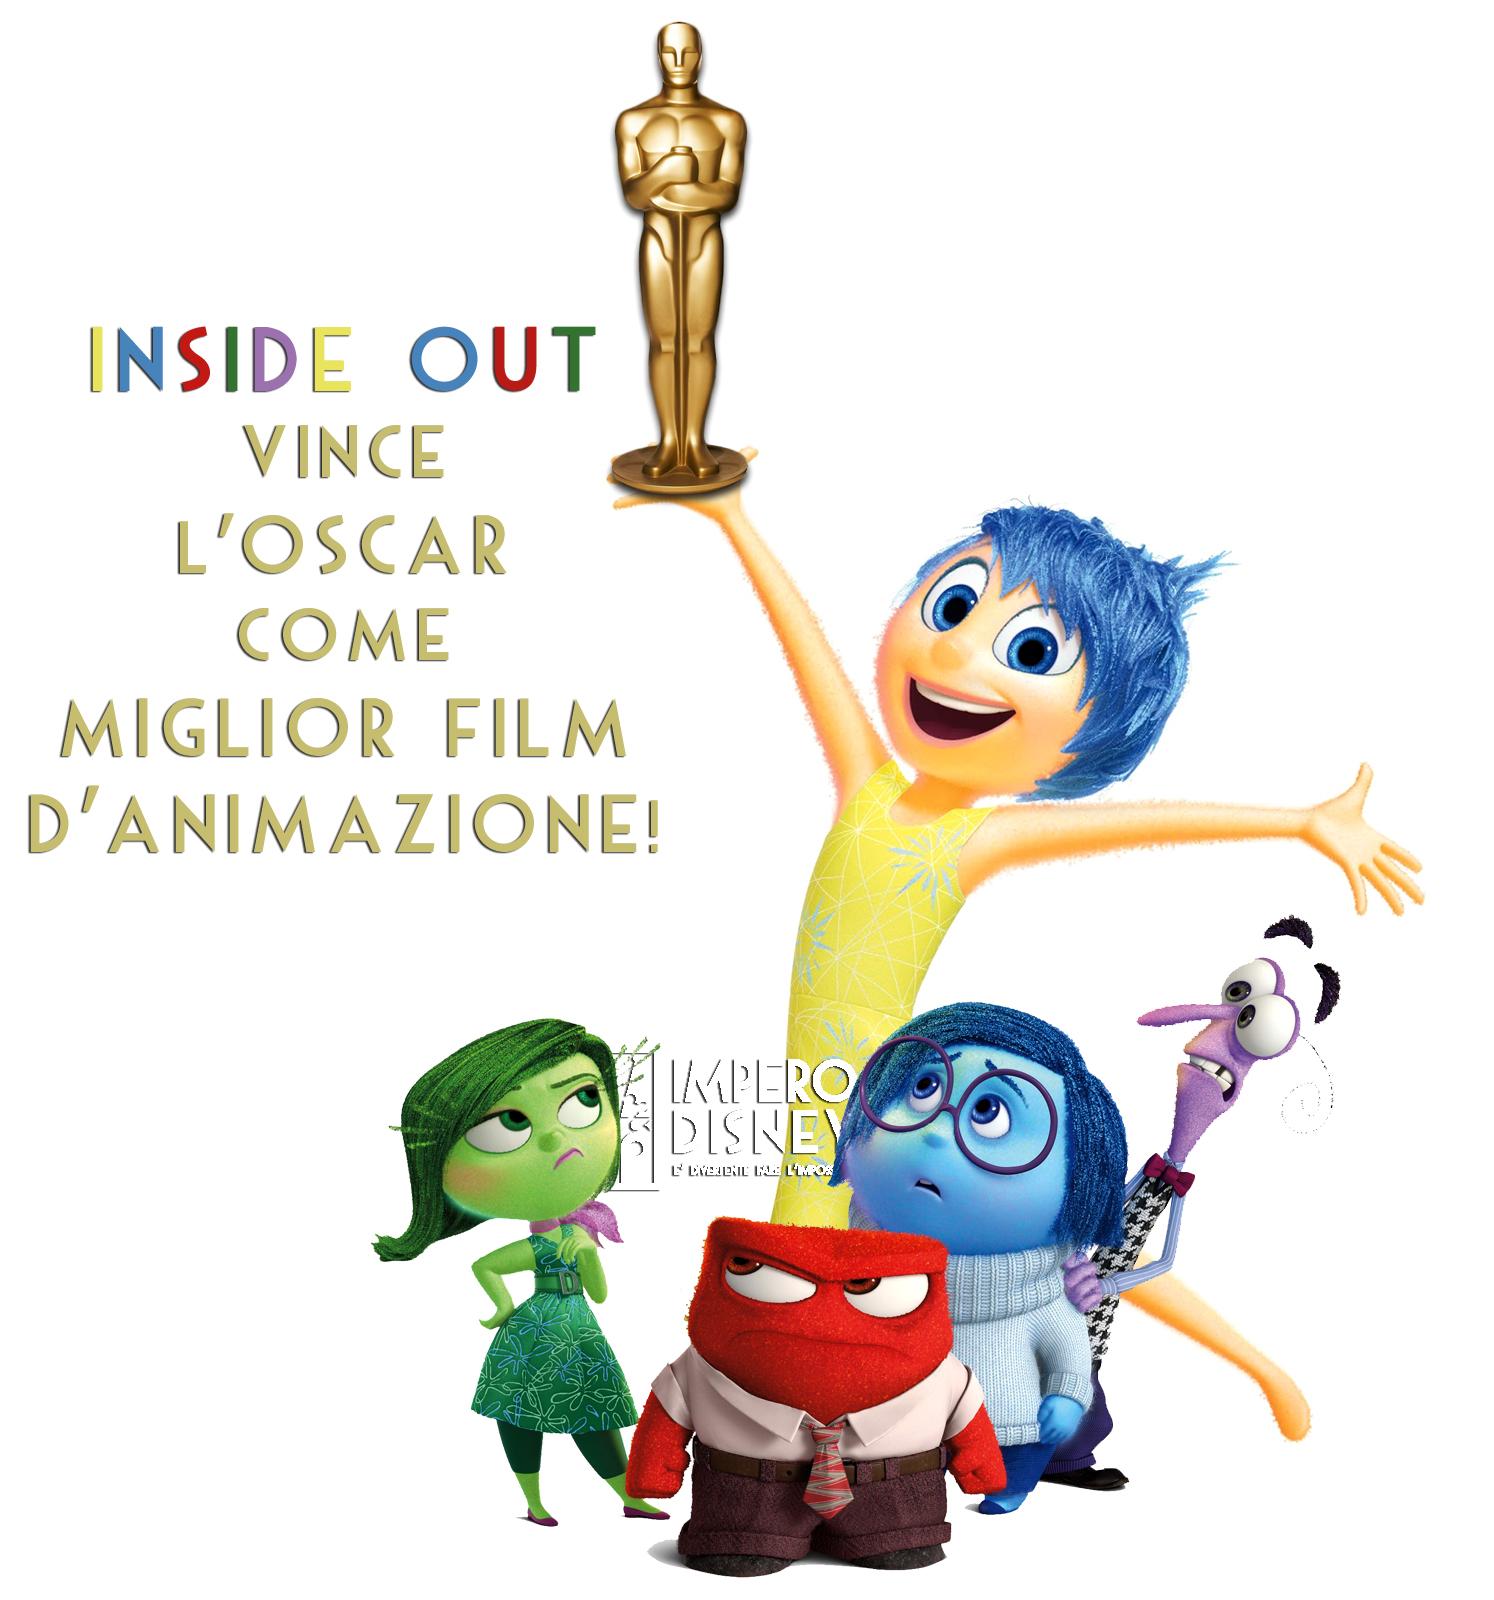 Inside Out Oscar